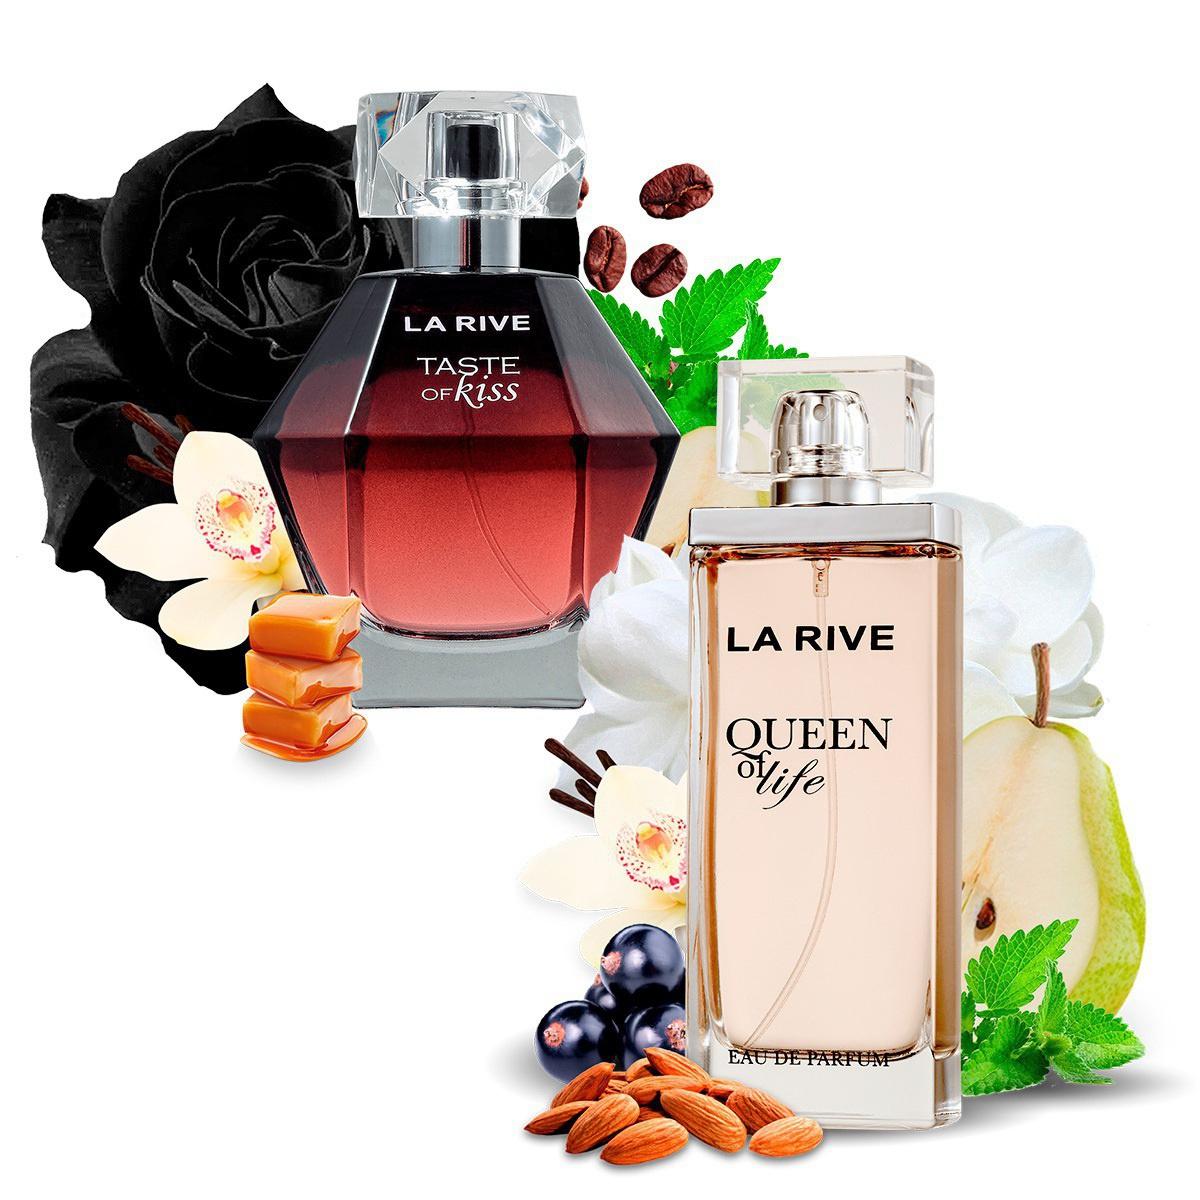 Kit 2 Perfumes, Queen of Life e Taste of Kiss La Rive  - Mercari Perfumes